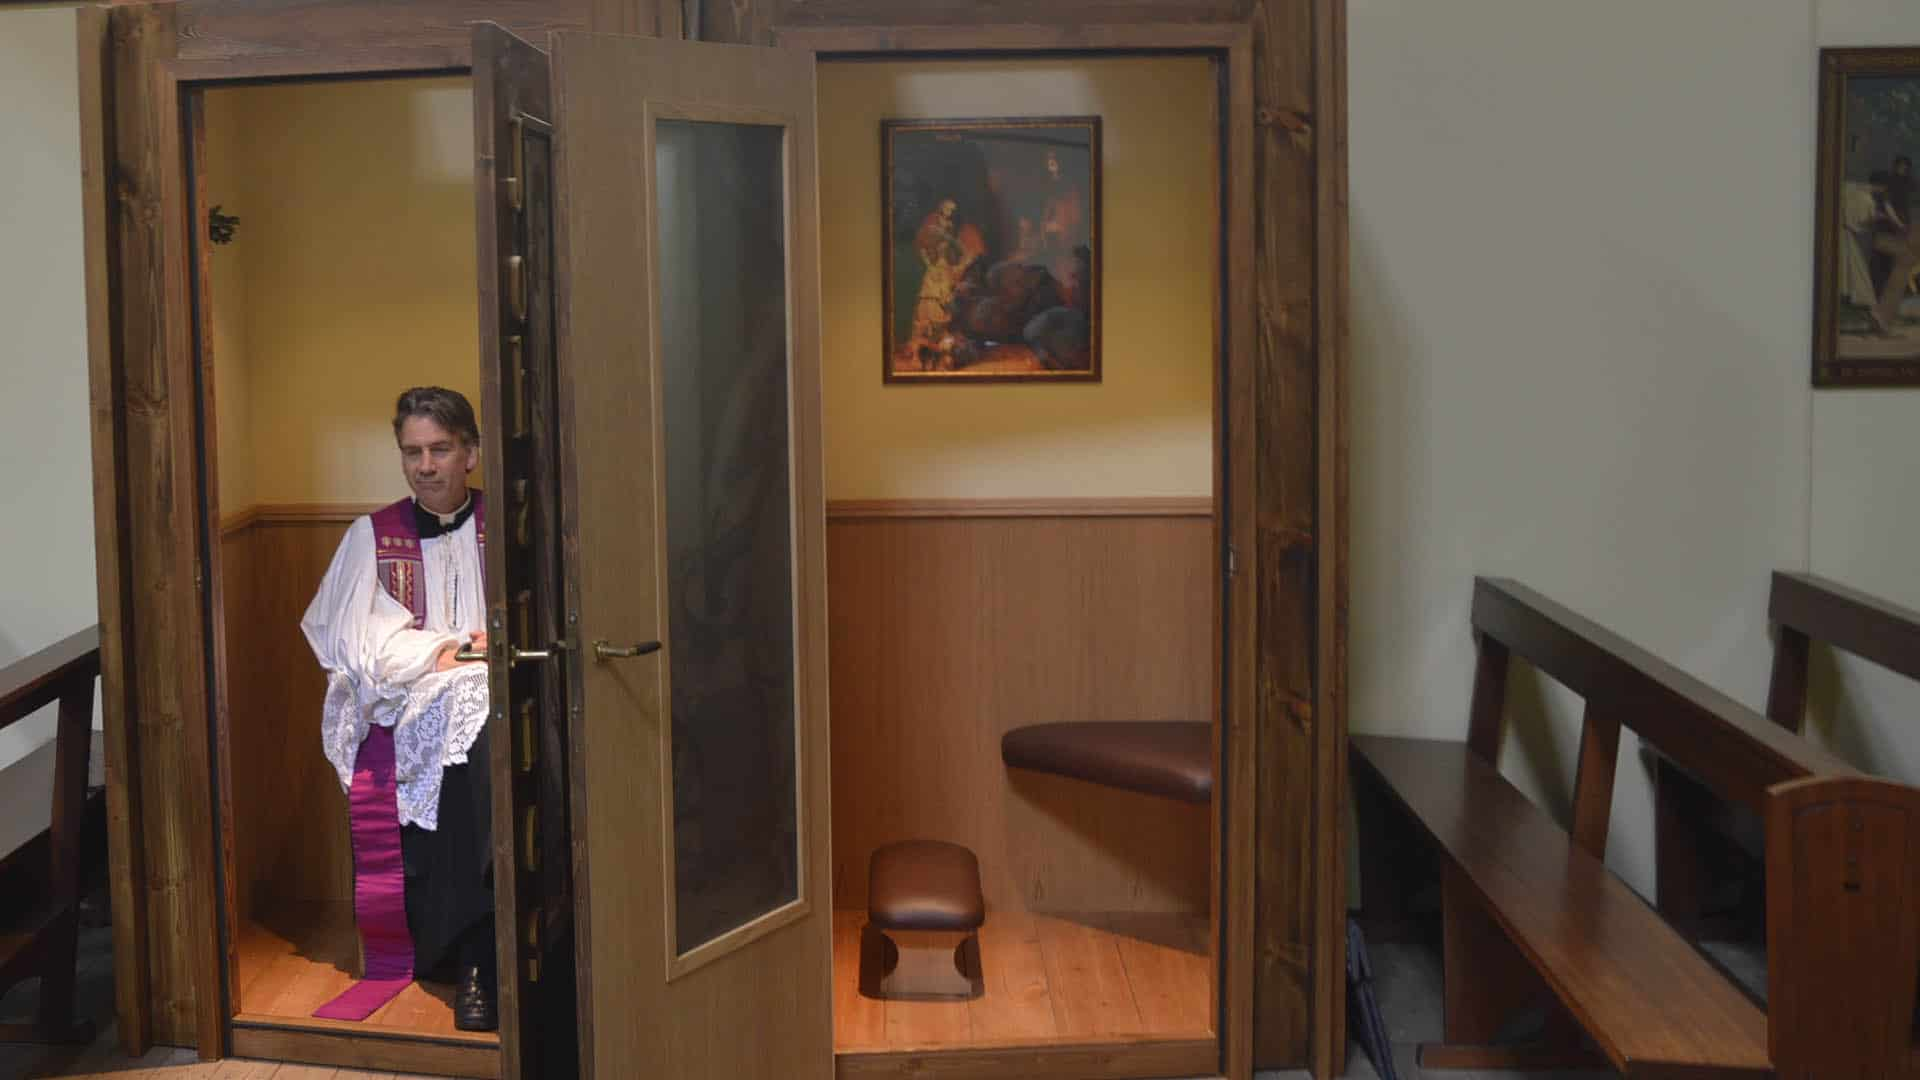 olv-ter-nood-sacrament-biecht-boete-verzoening